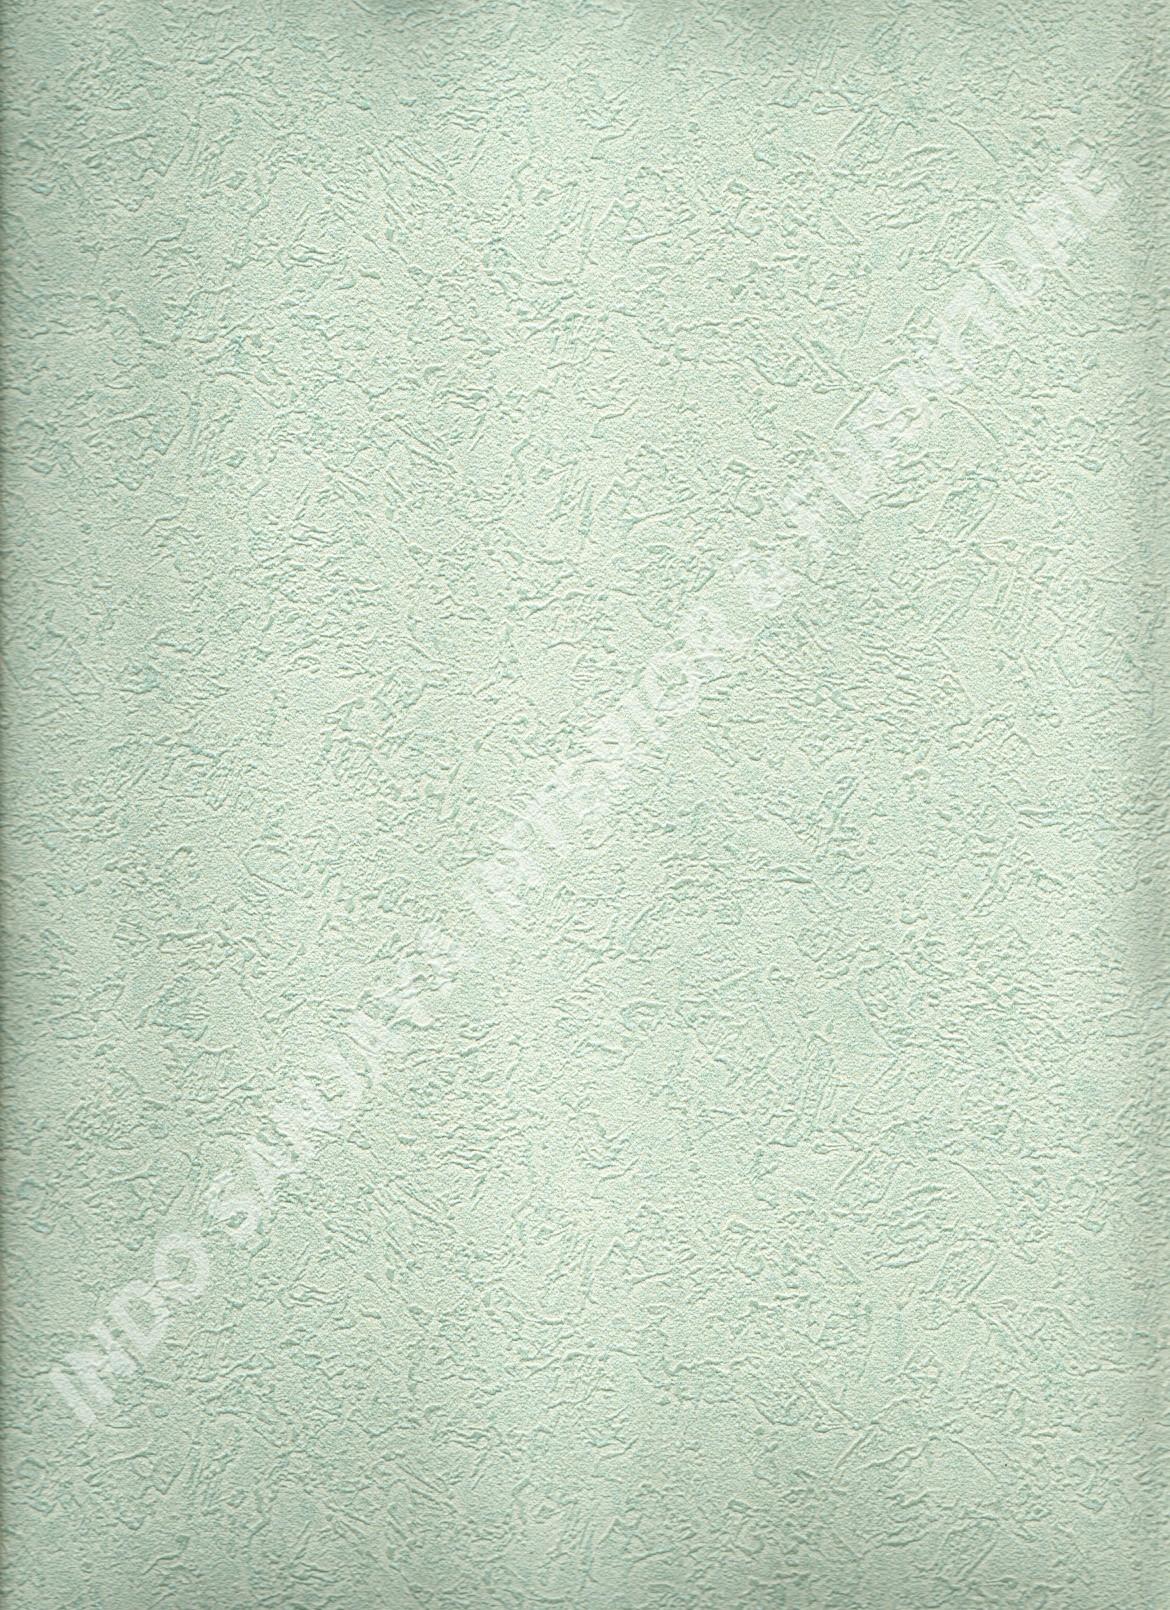 wallpaper   Wallpaper Minimalis Polos 11065:11065 corak  warna